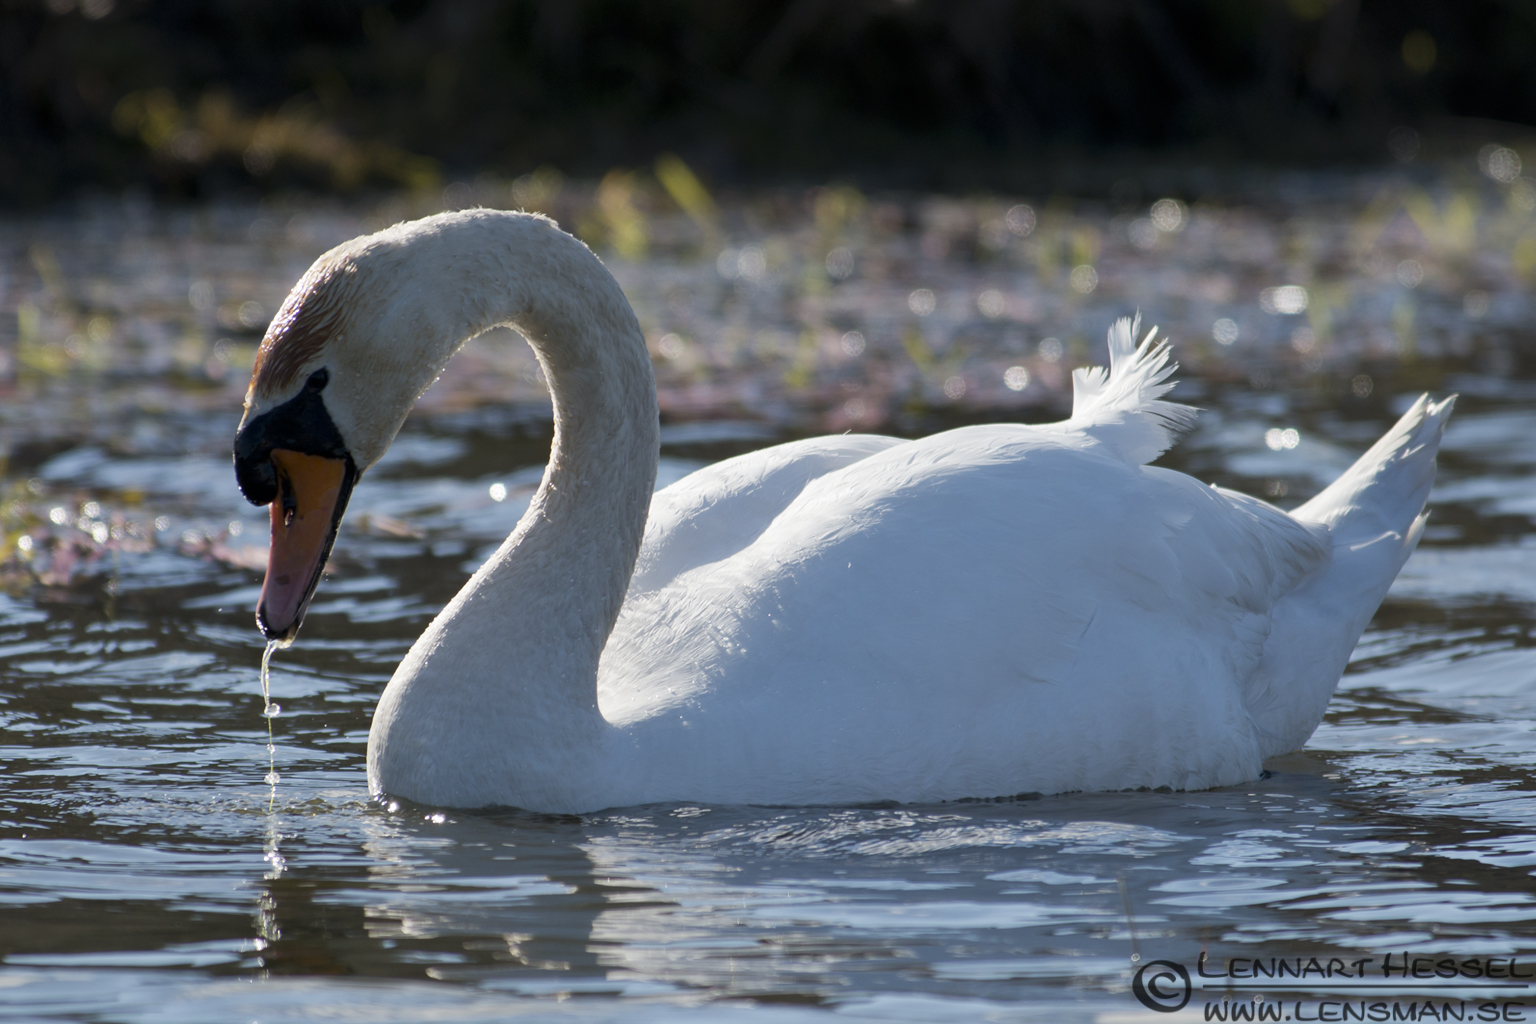 Mute Swan at Hökällan, Gothenburg nikon d800